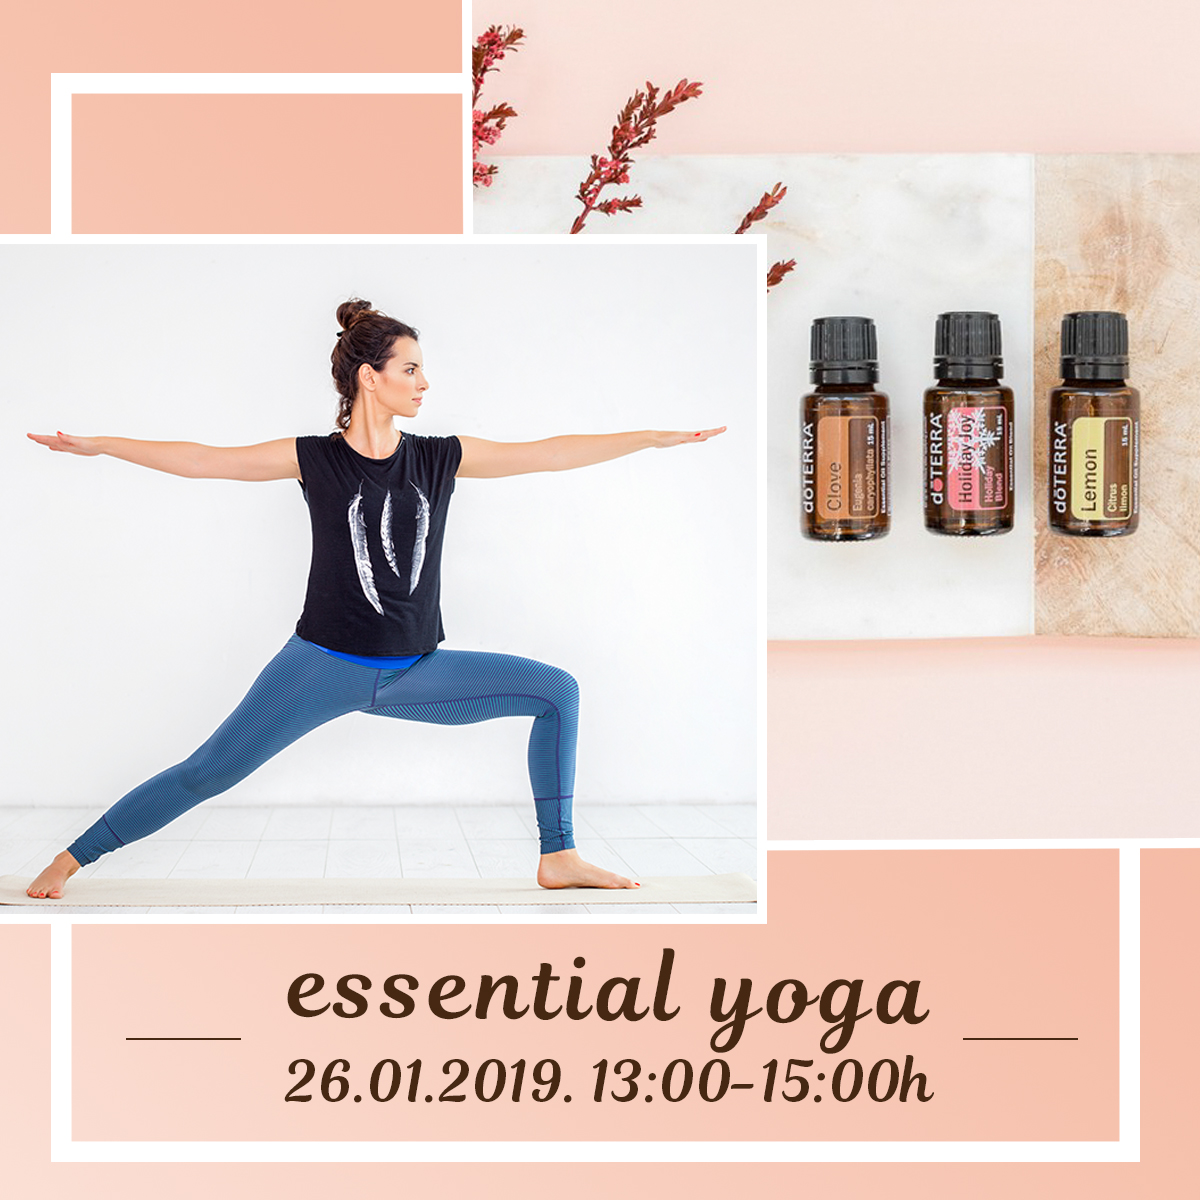 Essential yoga - 26. januar 2019.